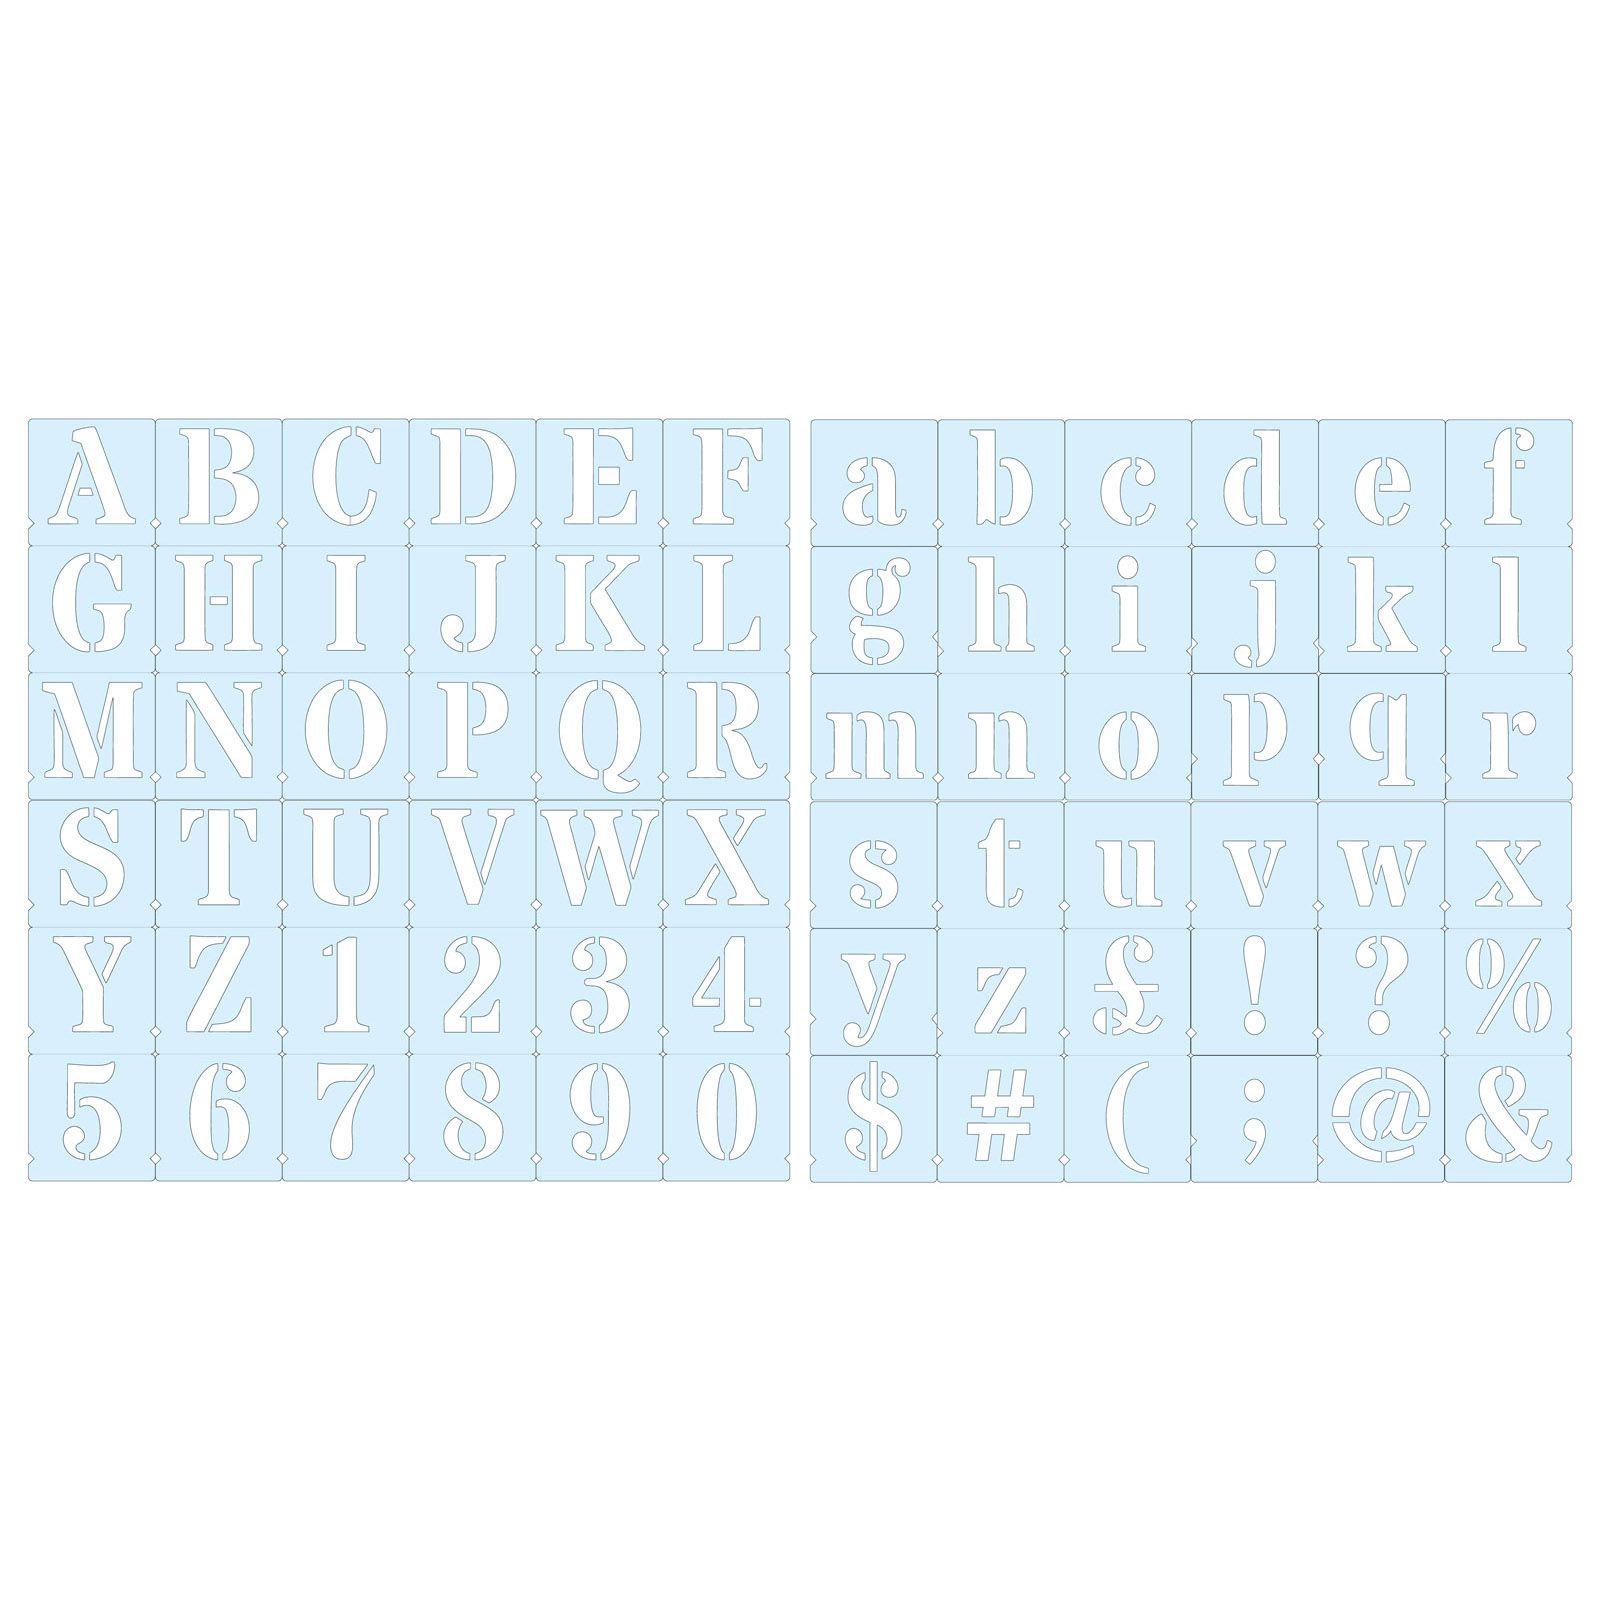 Roman Alphabet Numbers And Symbols On 72 Individual Stencils